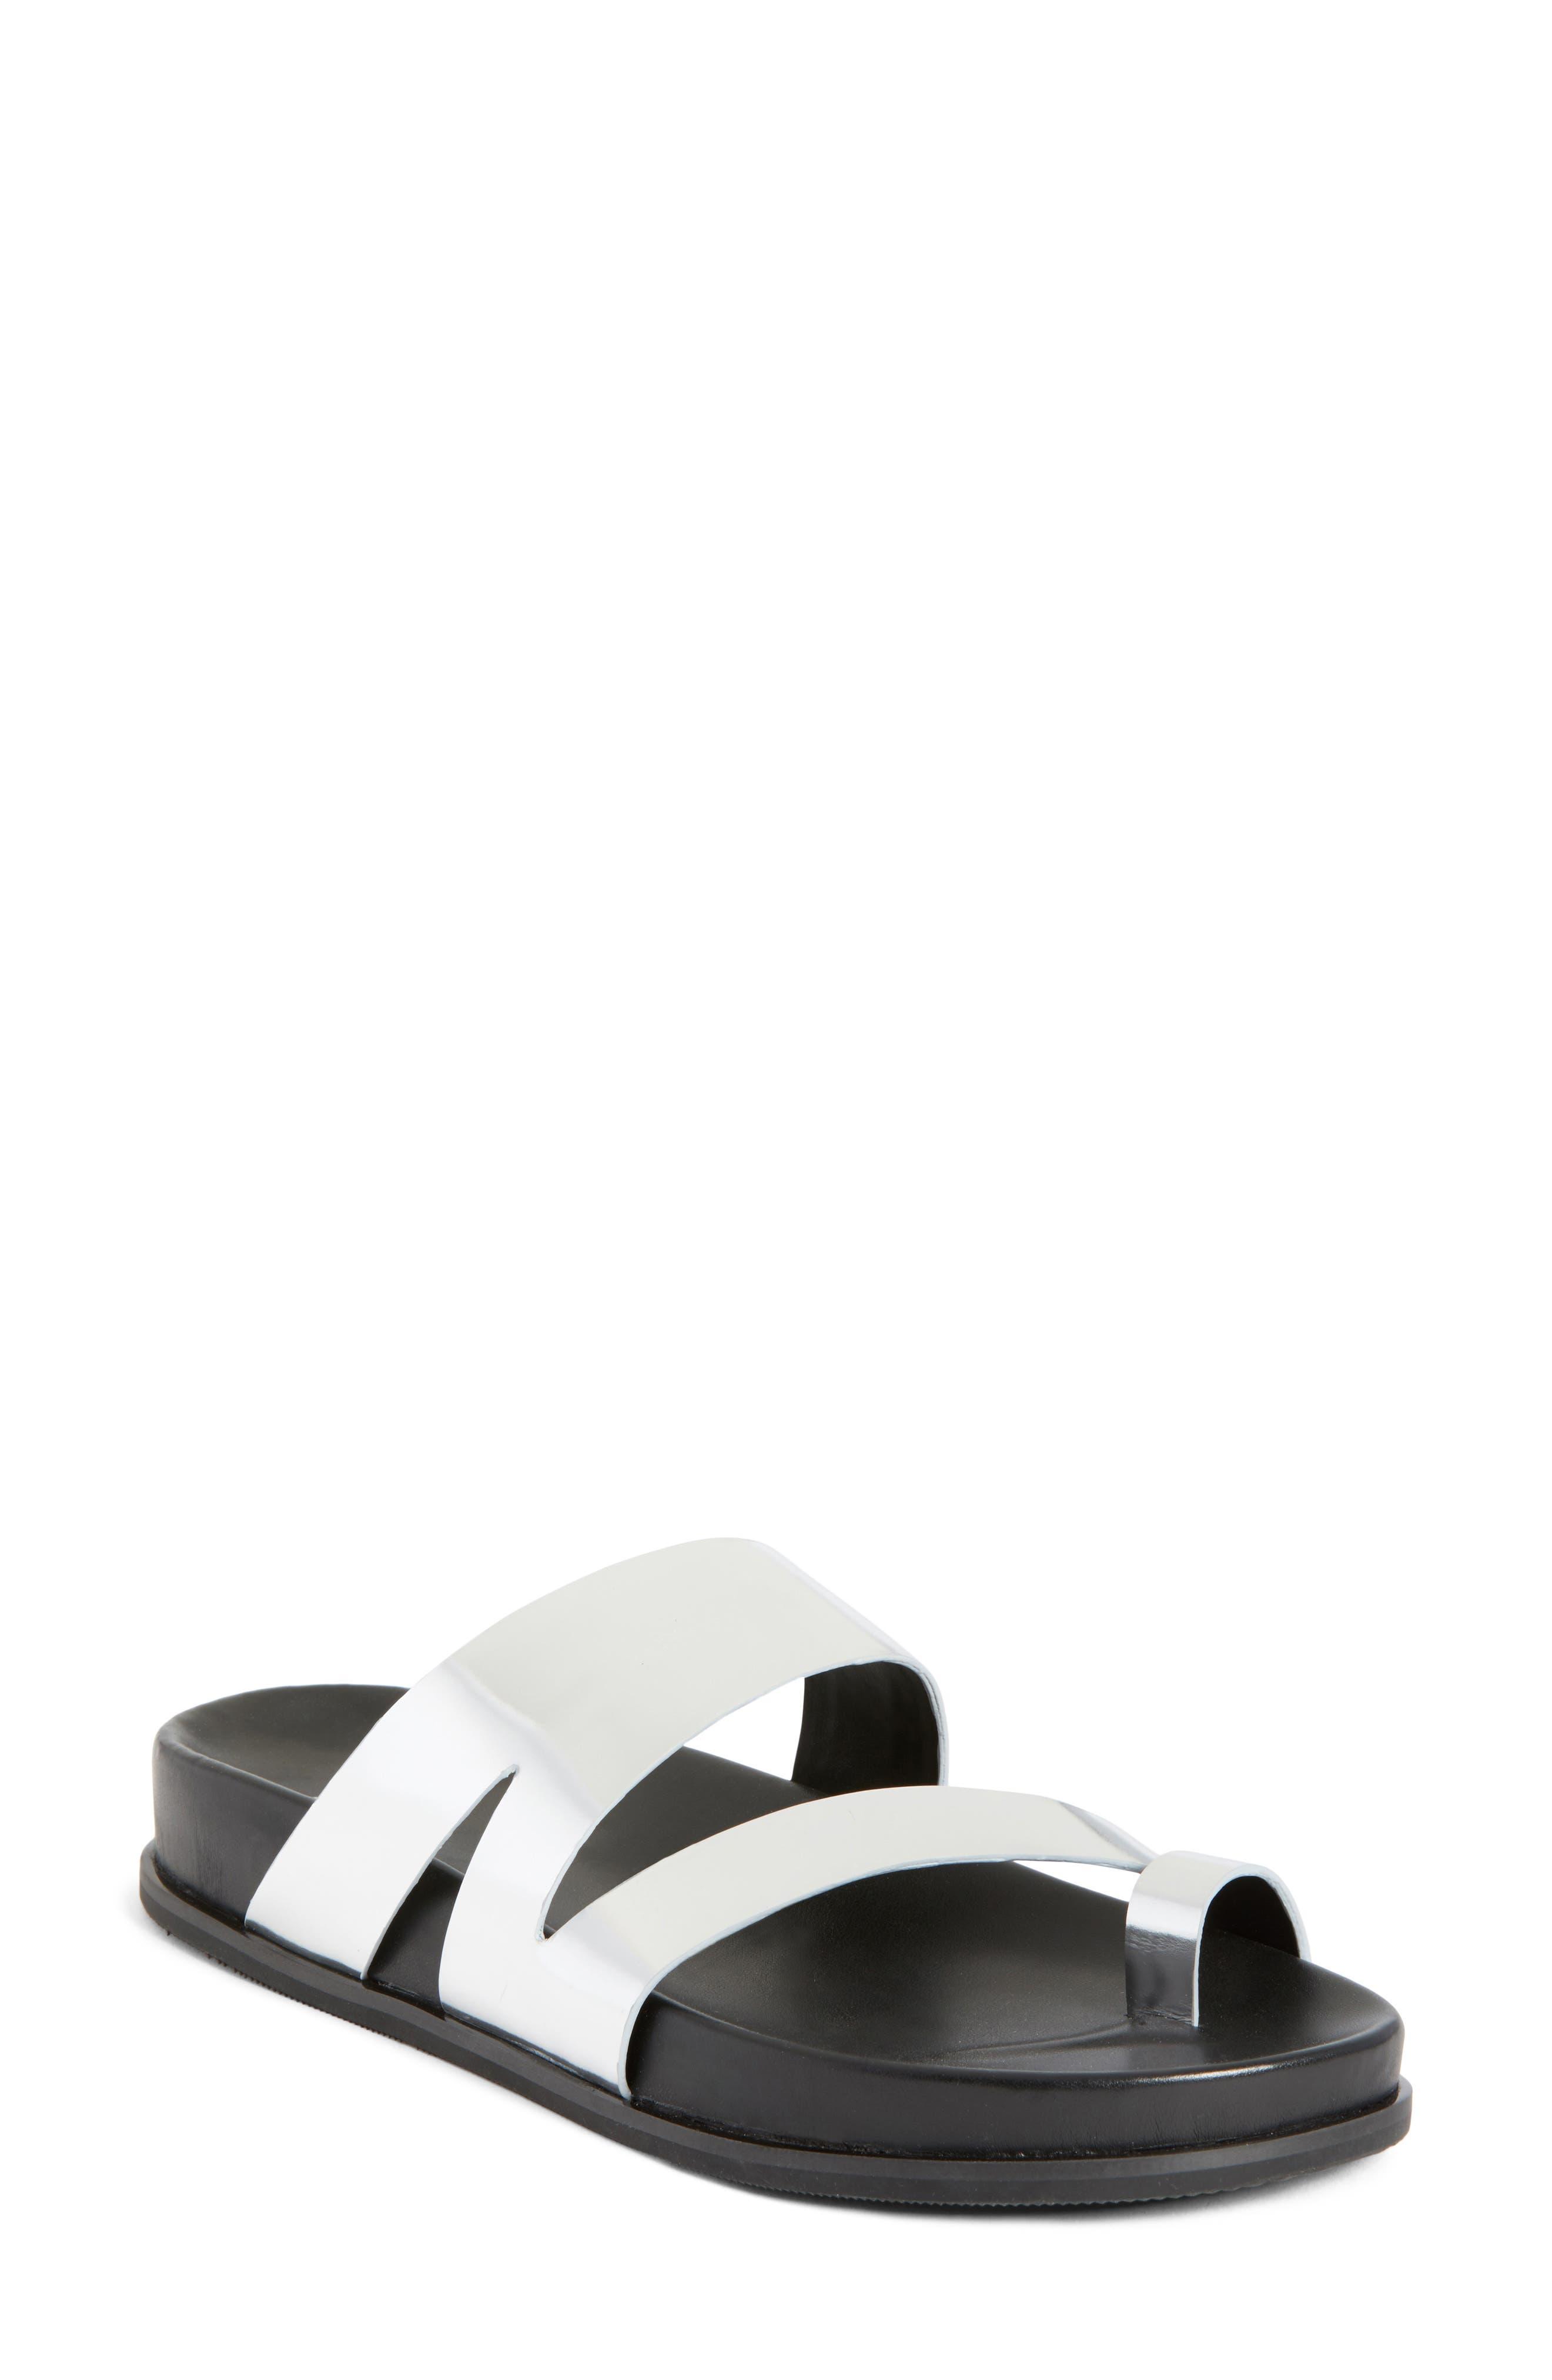 Yamini Sandal,                         Main,                         color, Silver Leather